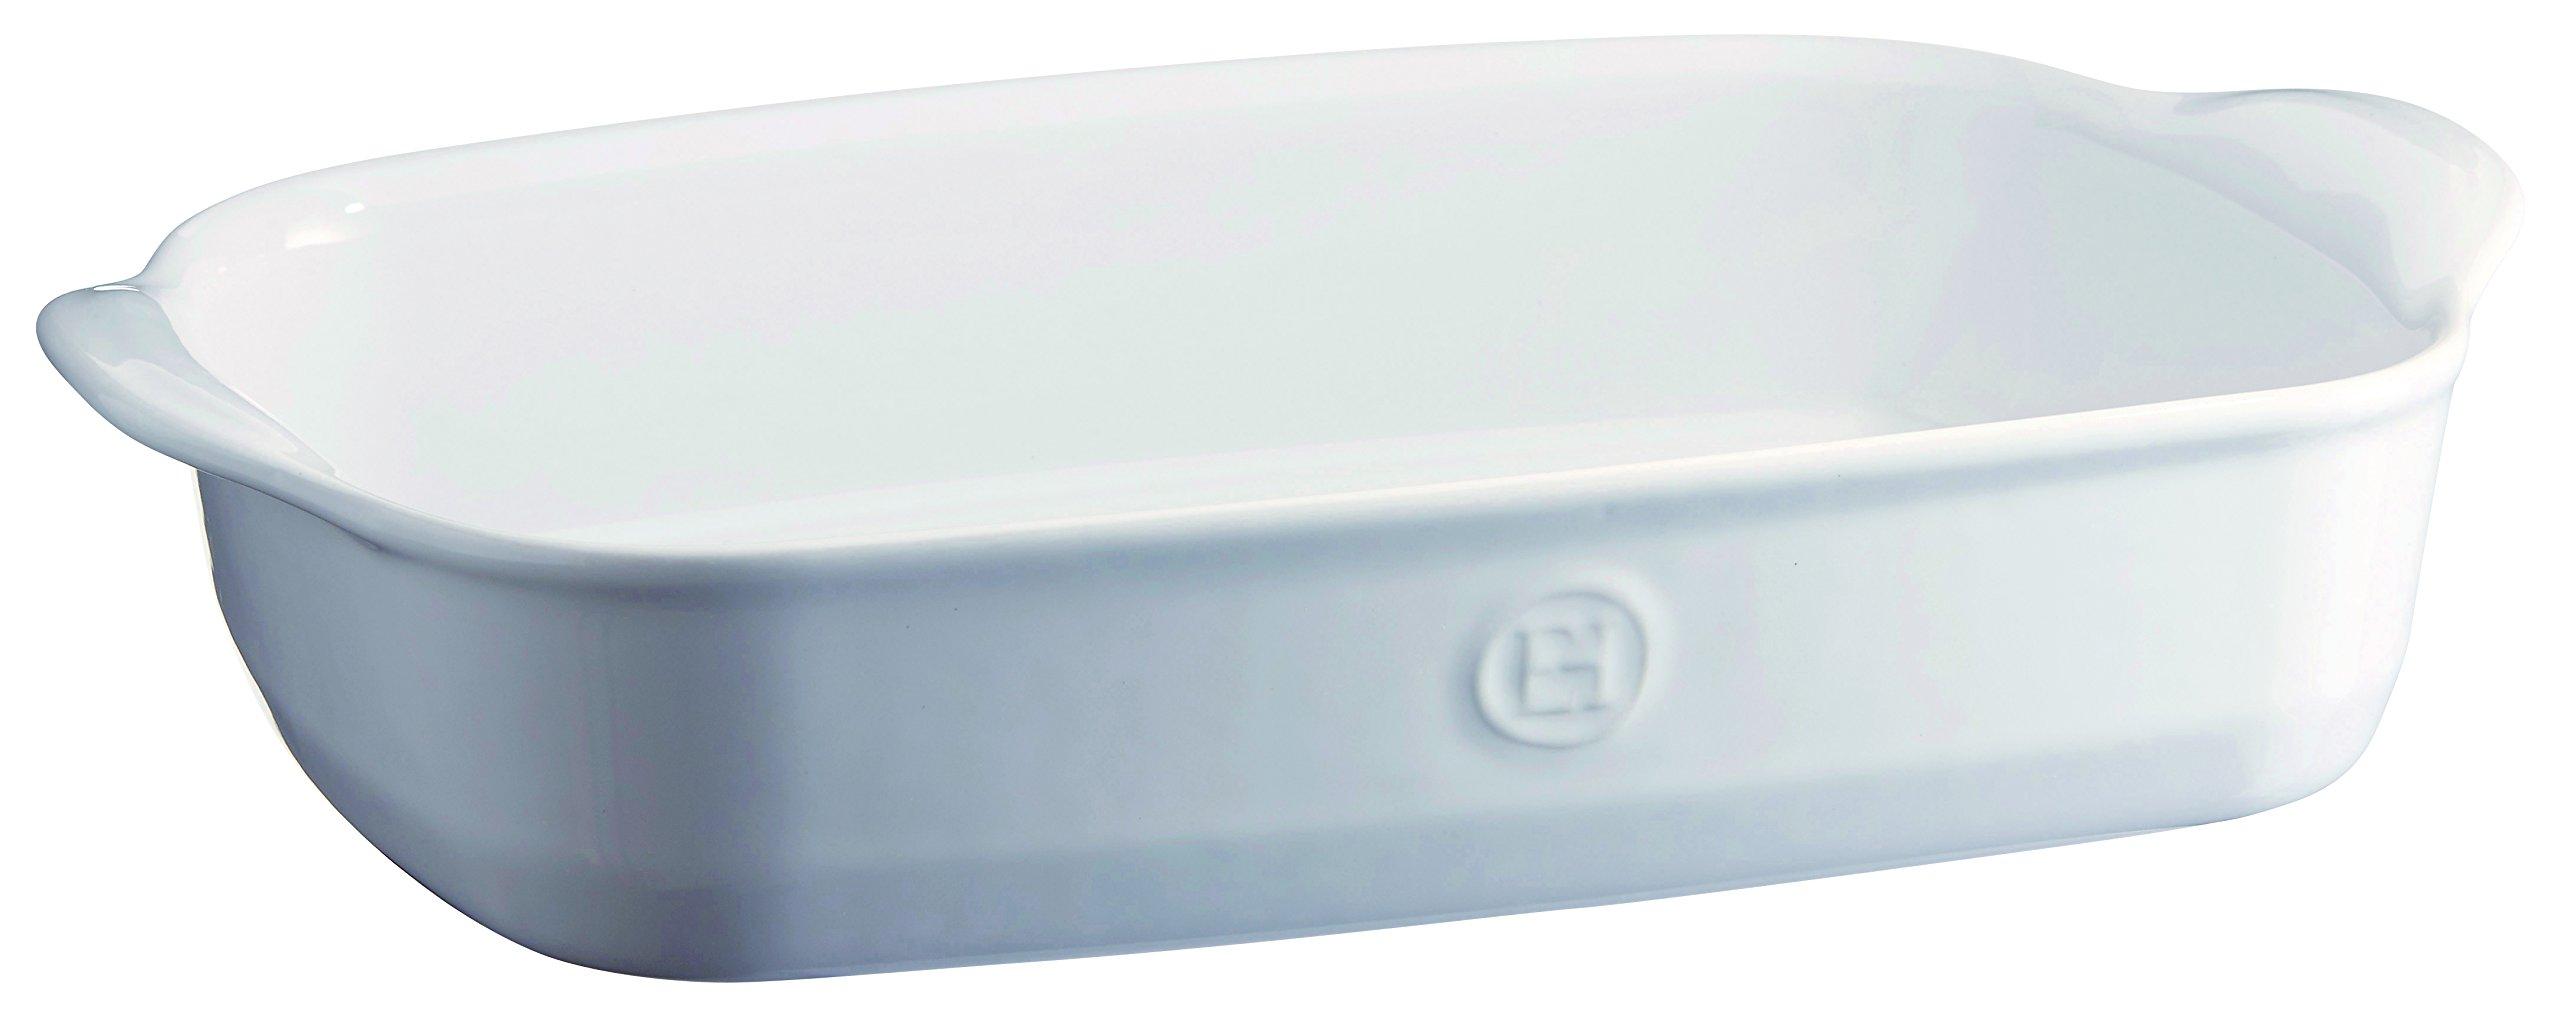 Emile Henry 119652 France Ovenware Ultime Rectangular Baking Dish, 14.2 x 9.1, Flour White by Emile Henry